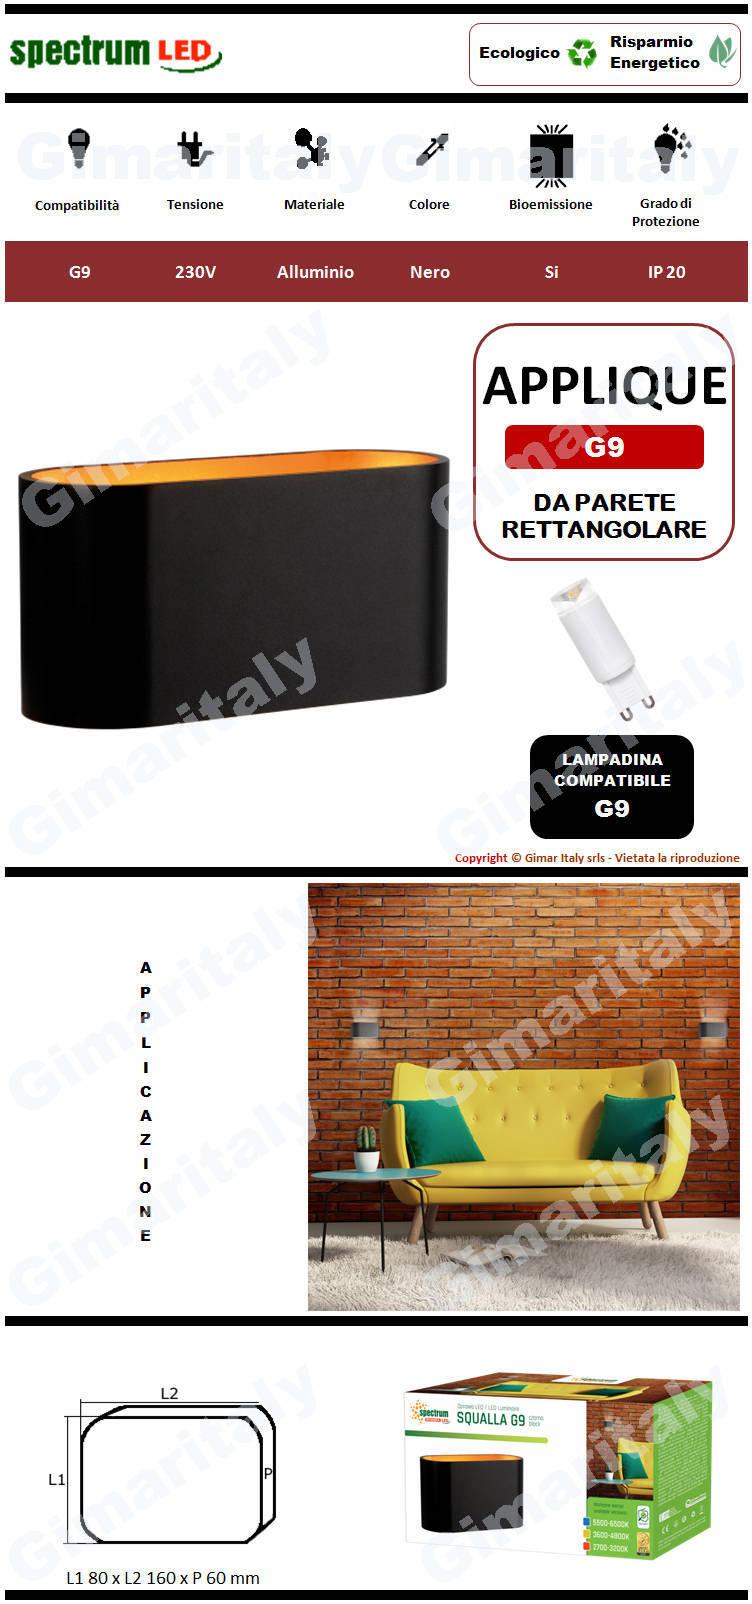 Applique Nera da parete per lampadina G9 Spectrum